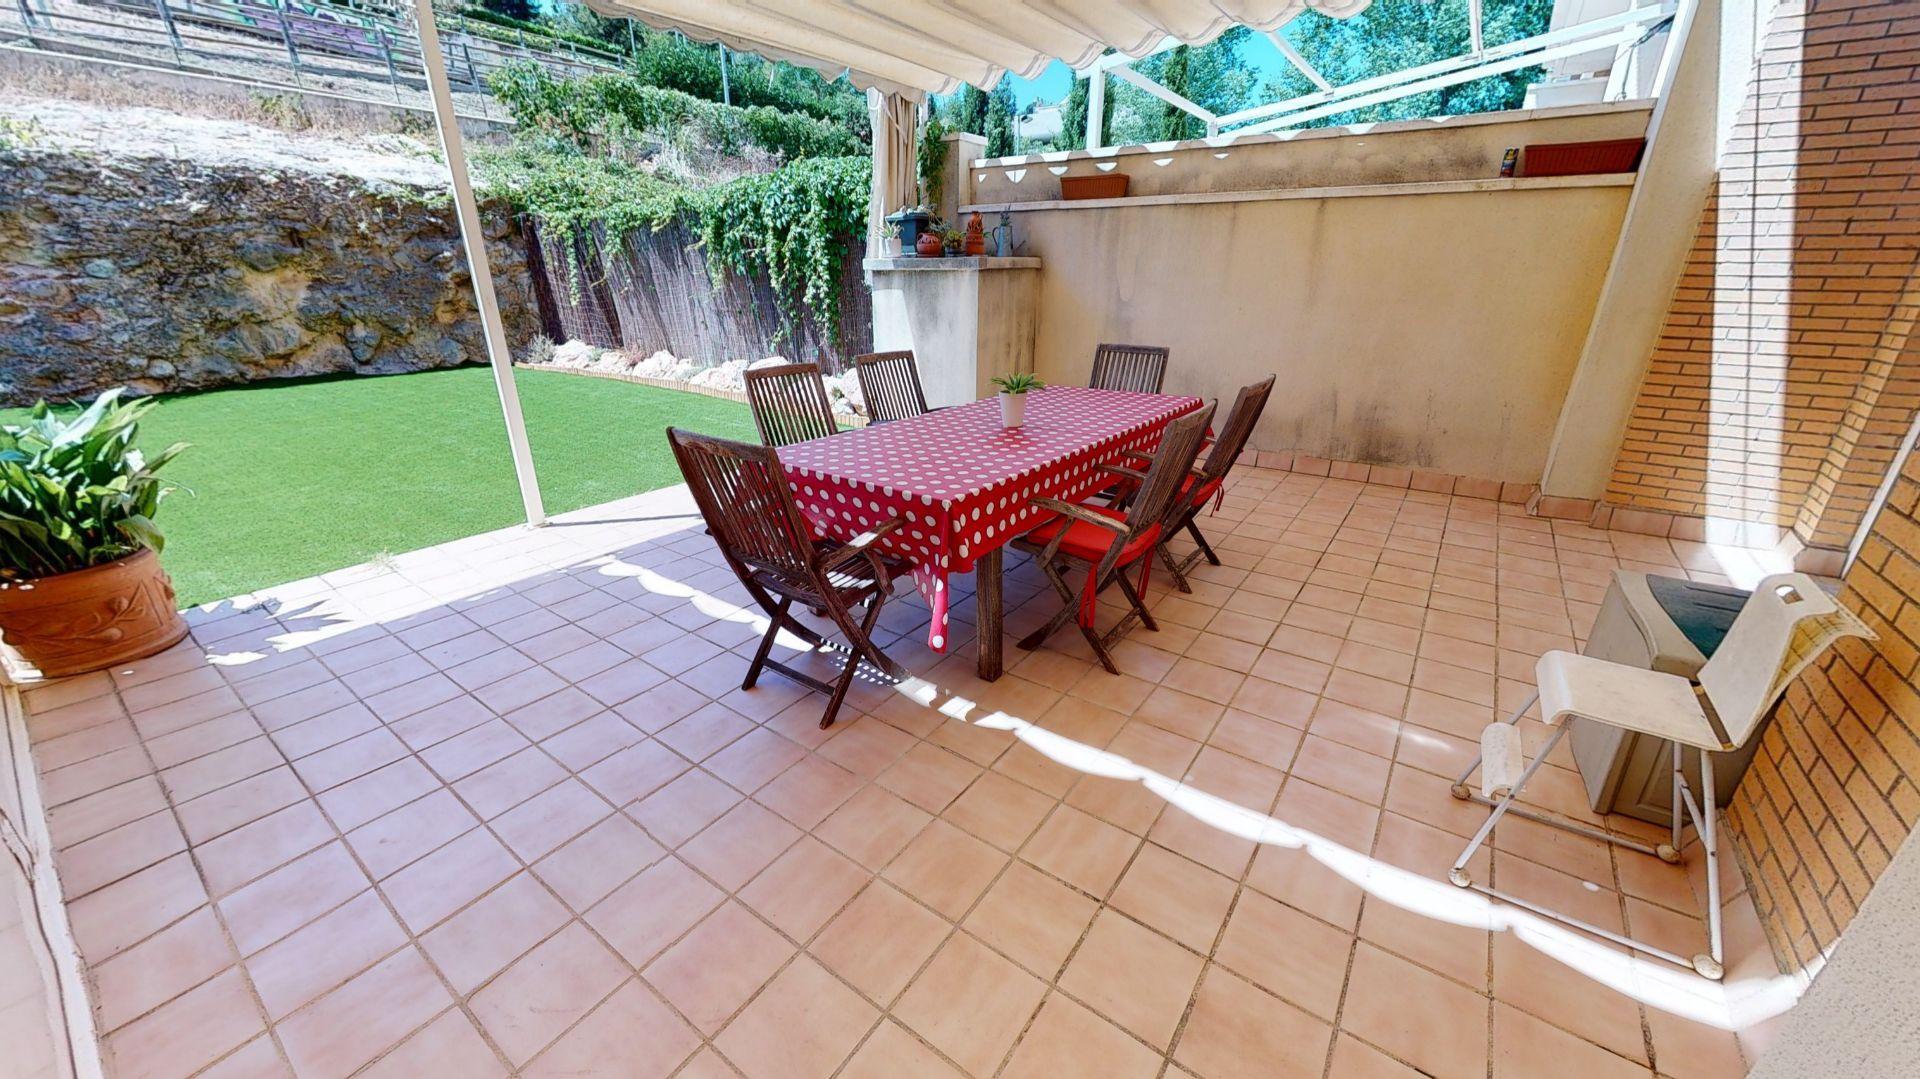 Flat in Tarragona, ARRABASADA, for sale